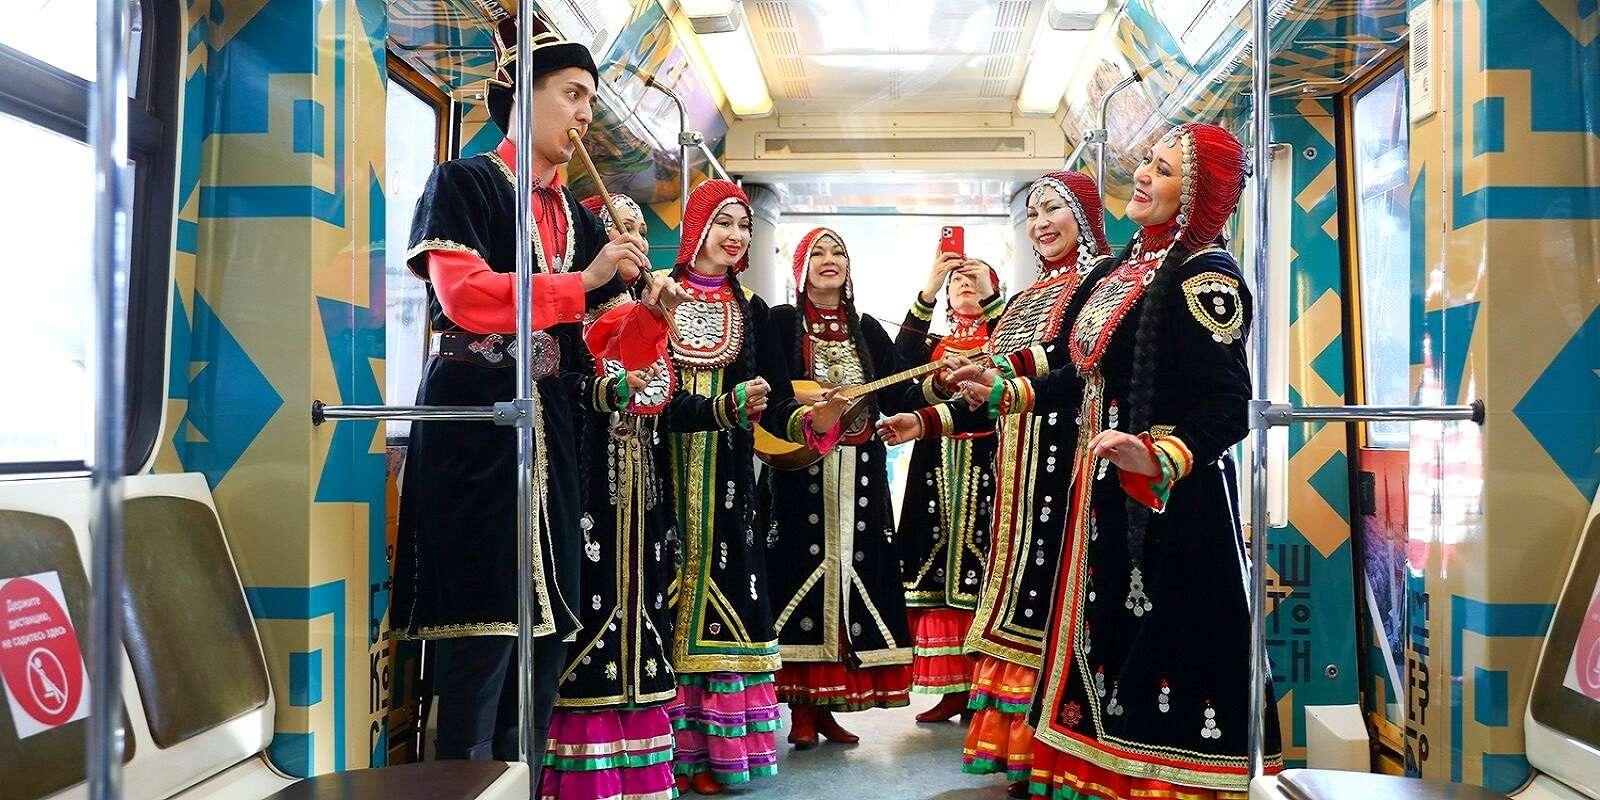 метро поезд «Республика Башкортостан»